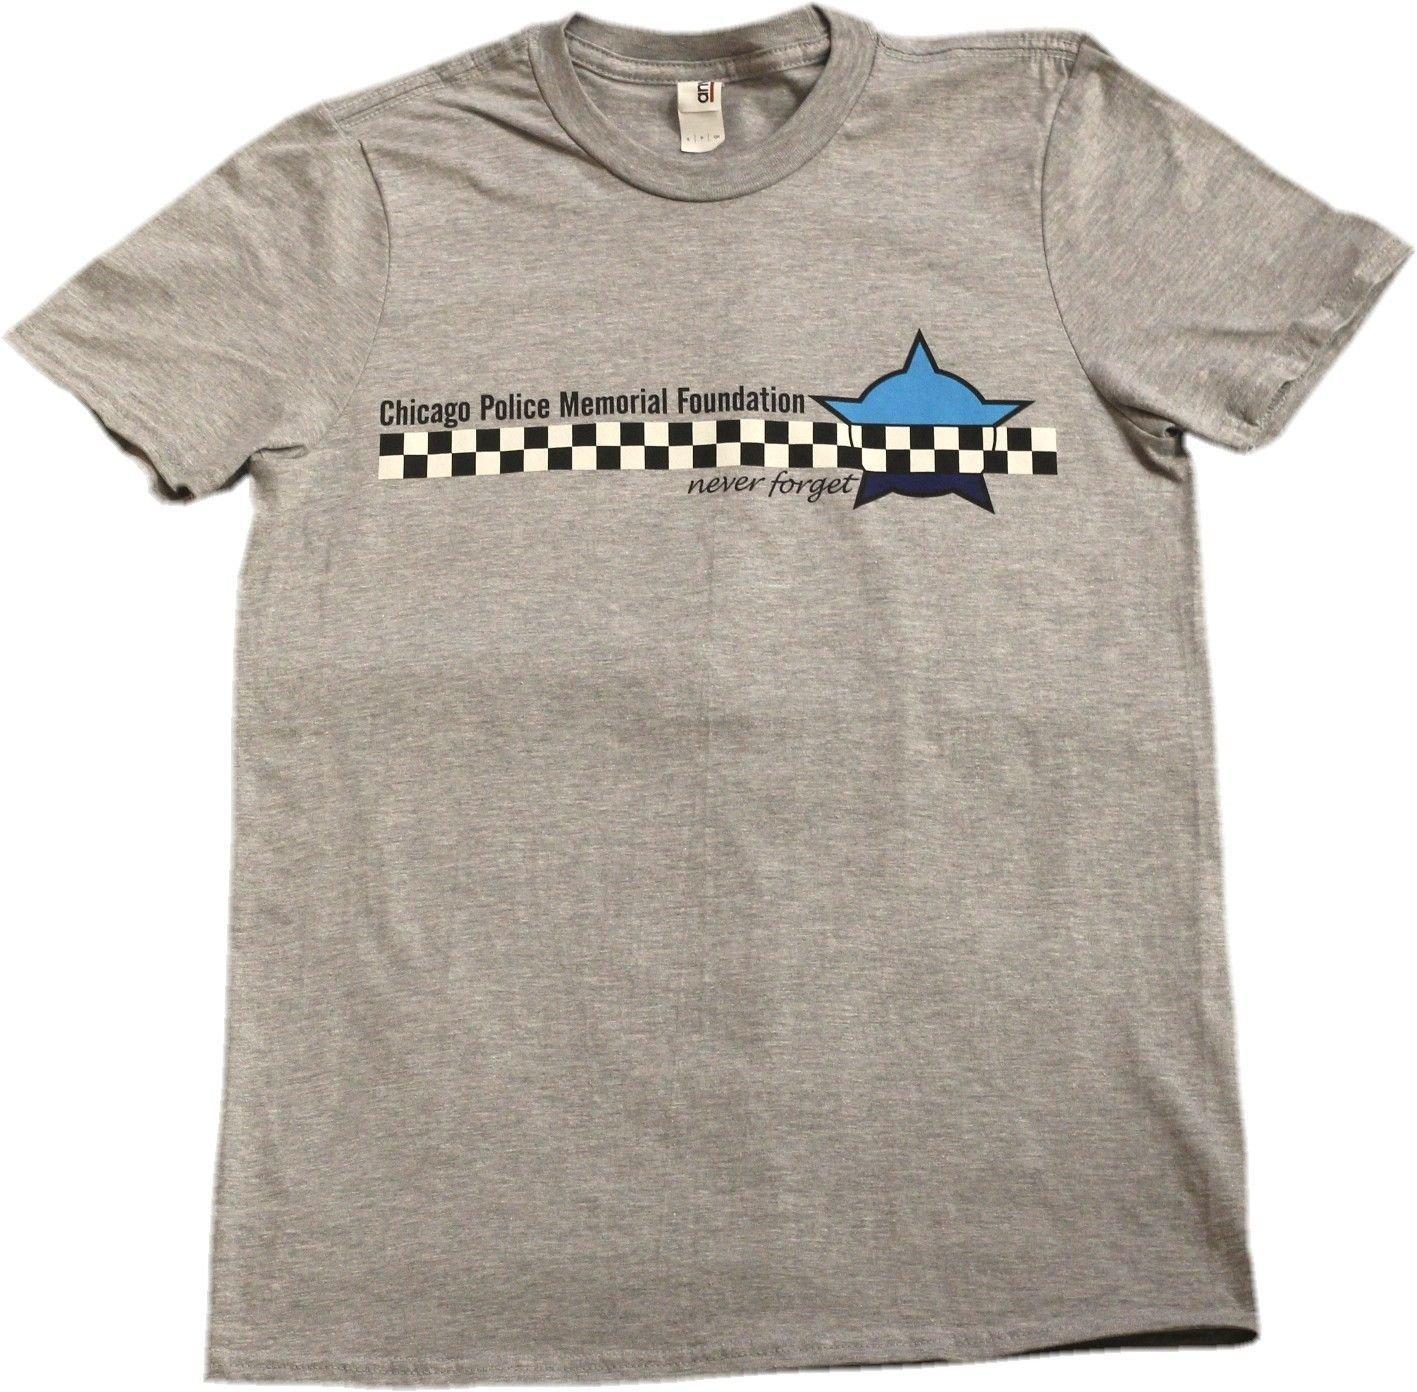 Chicago Police Memorial Foundation Never Forget T-shirt